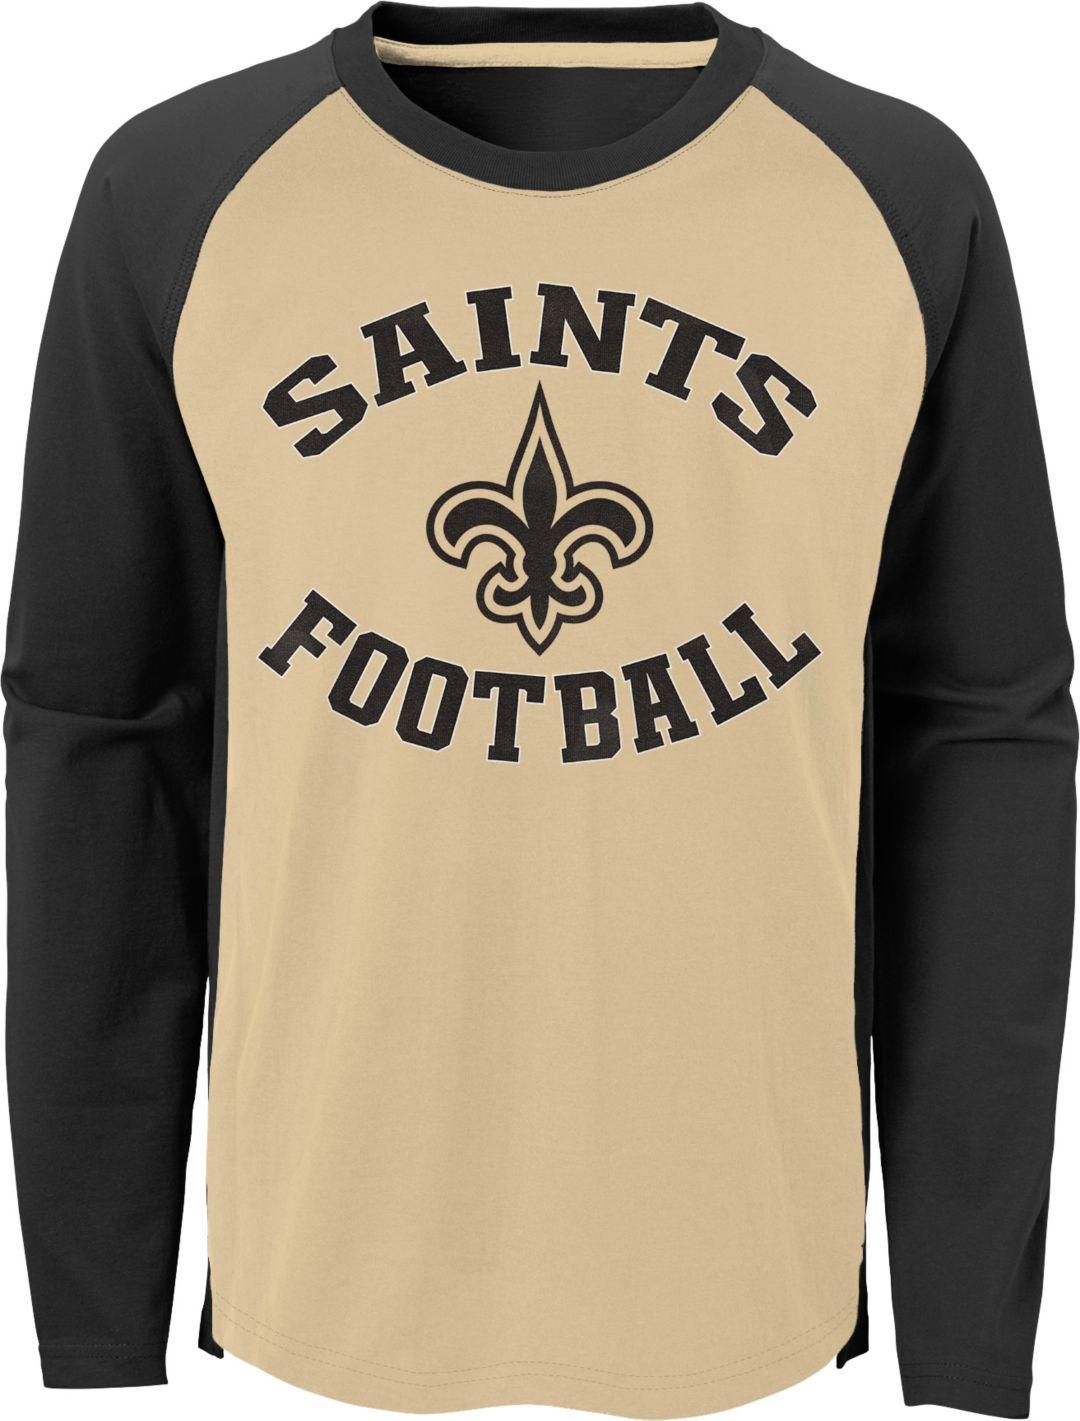 wholesale dealer d3a3a 2deea NFL Team Apparel Youth New Orleans Saints Air Raid Long Sleeve Black Shirt